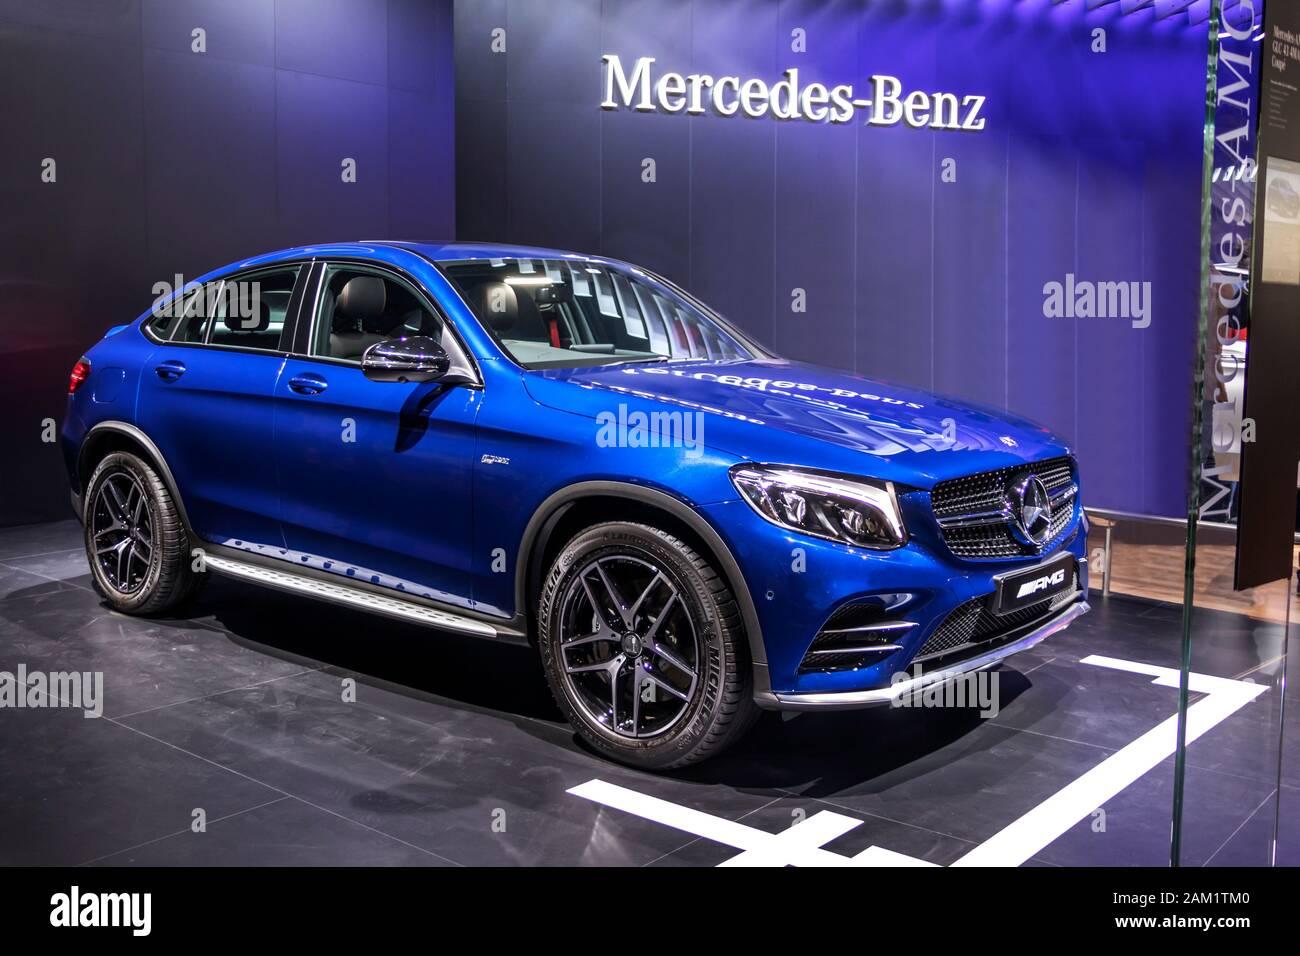 Mercedes Benz Glc Coupe 4matic Suv At Auto Expo Stock Photo Alamy